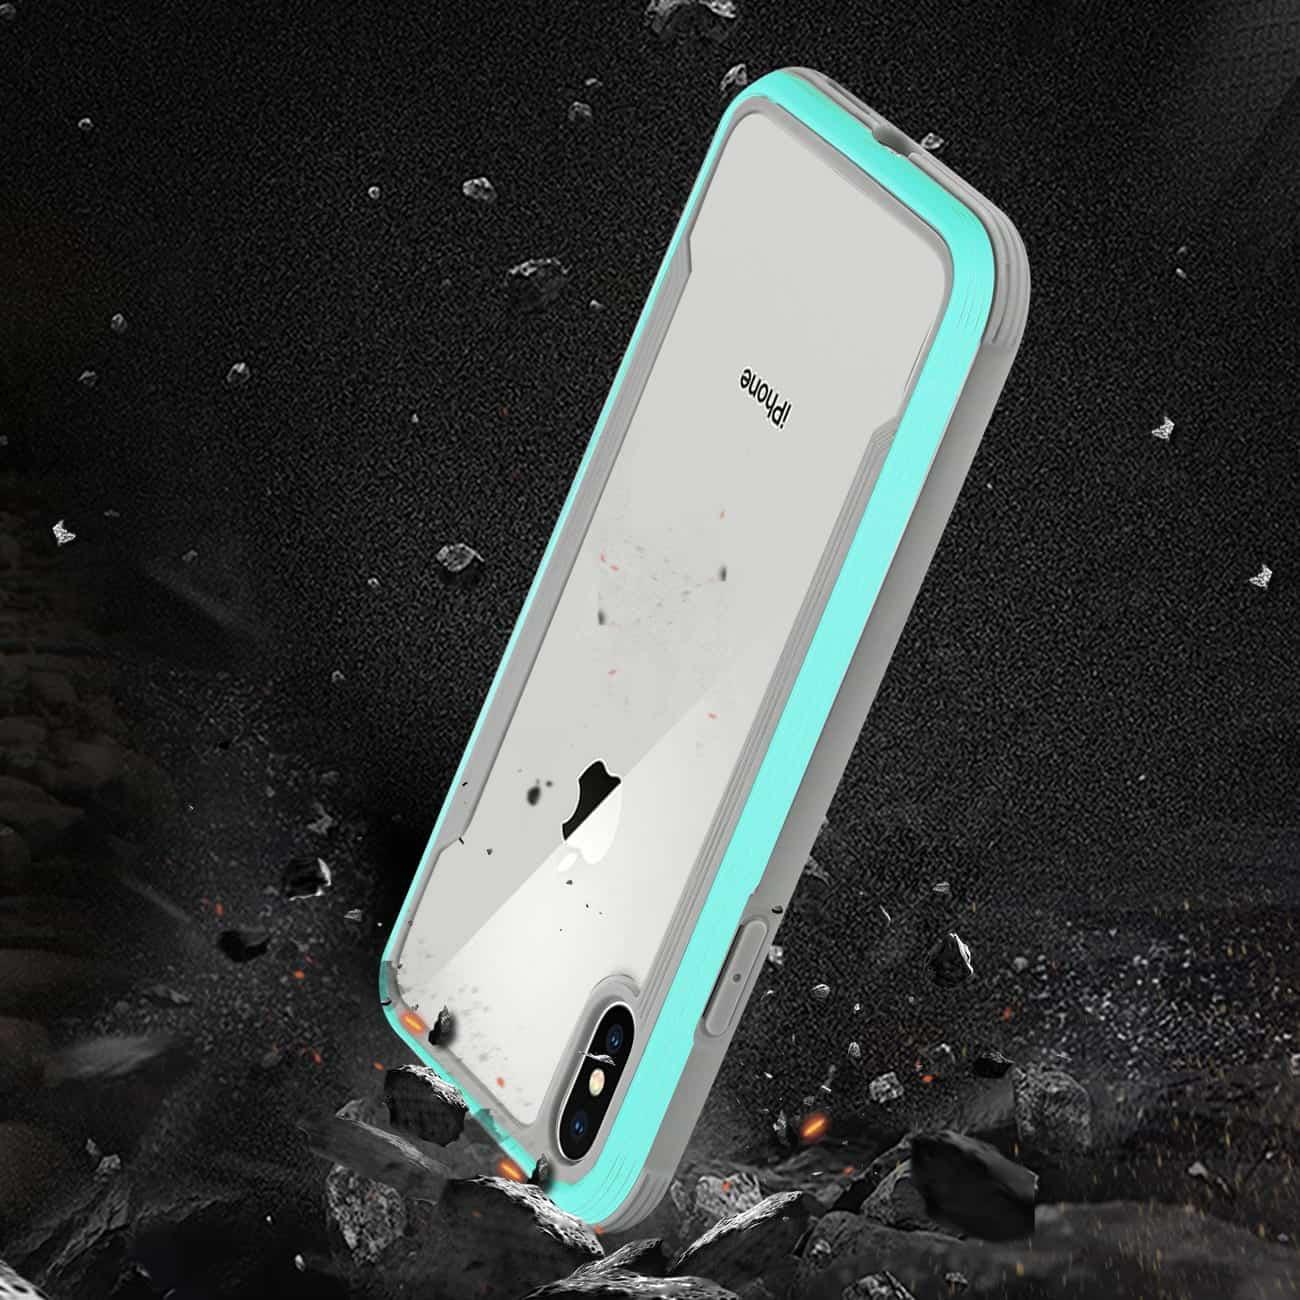 APPLE IPHONE X Defense Shield Case In Blue